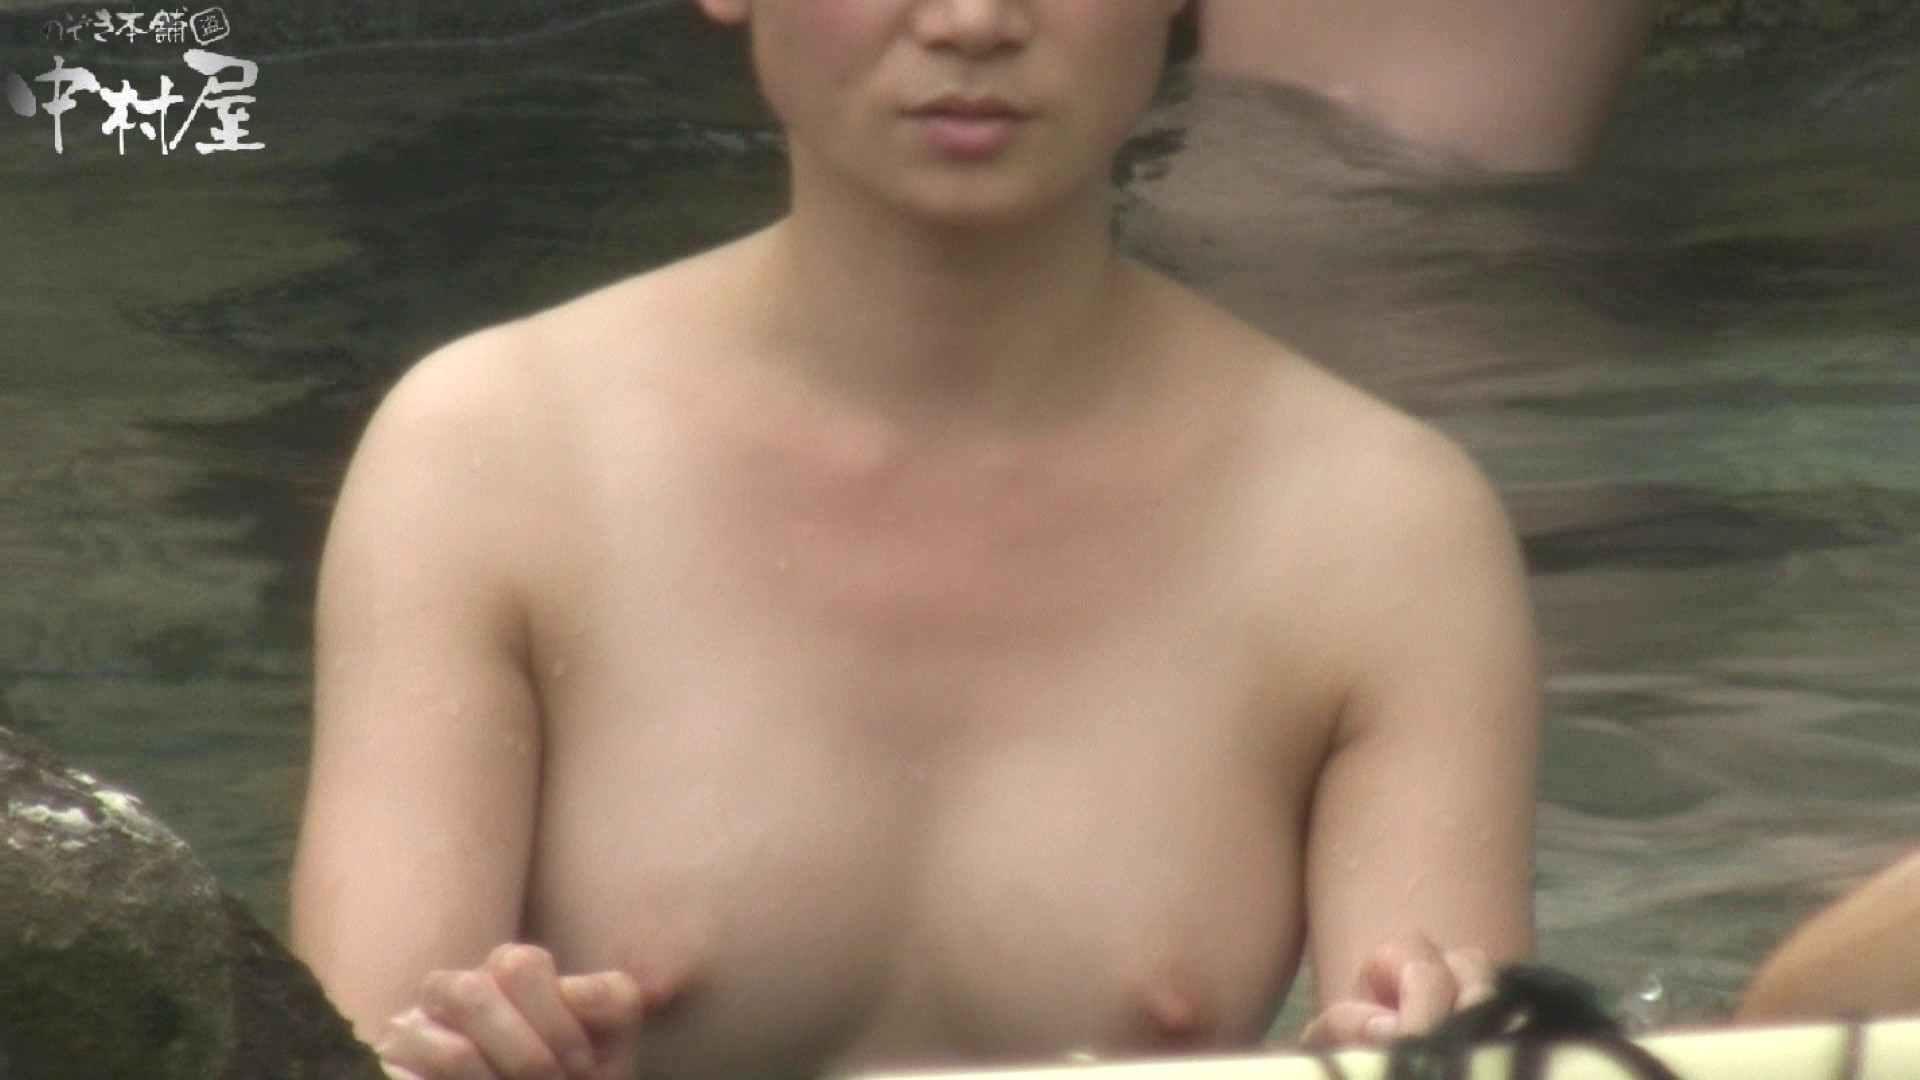 Aquaな露天風呂Vol.905 OLセックス  71画像 45